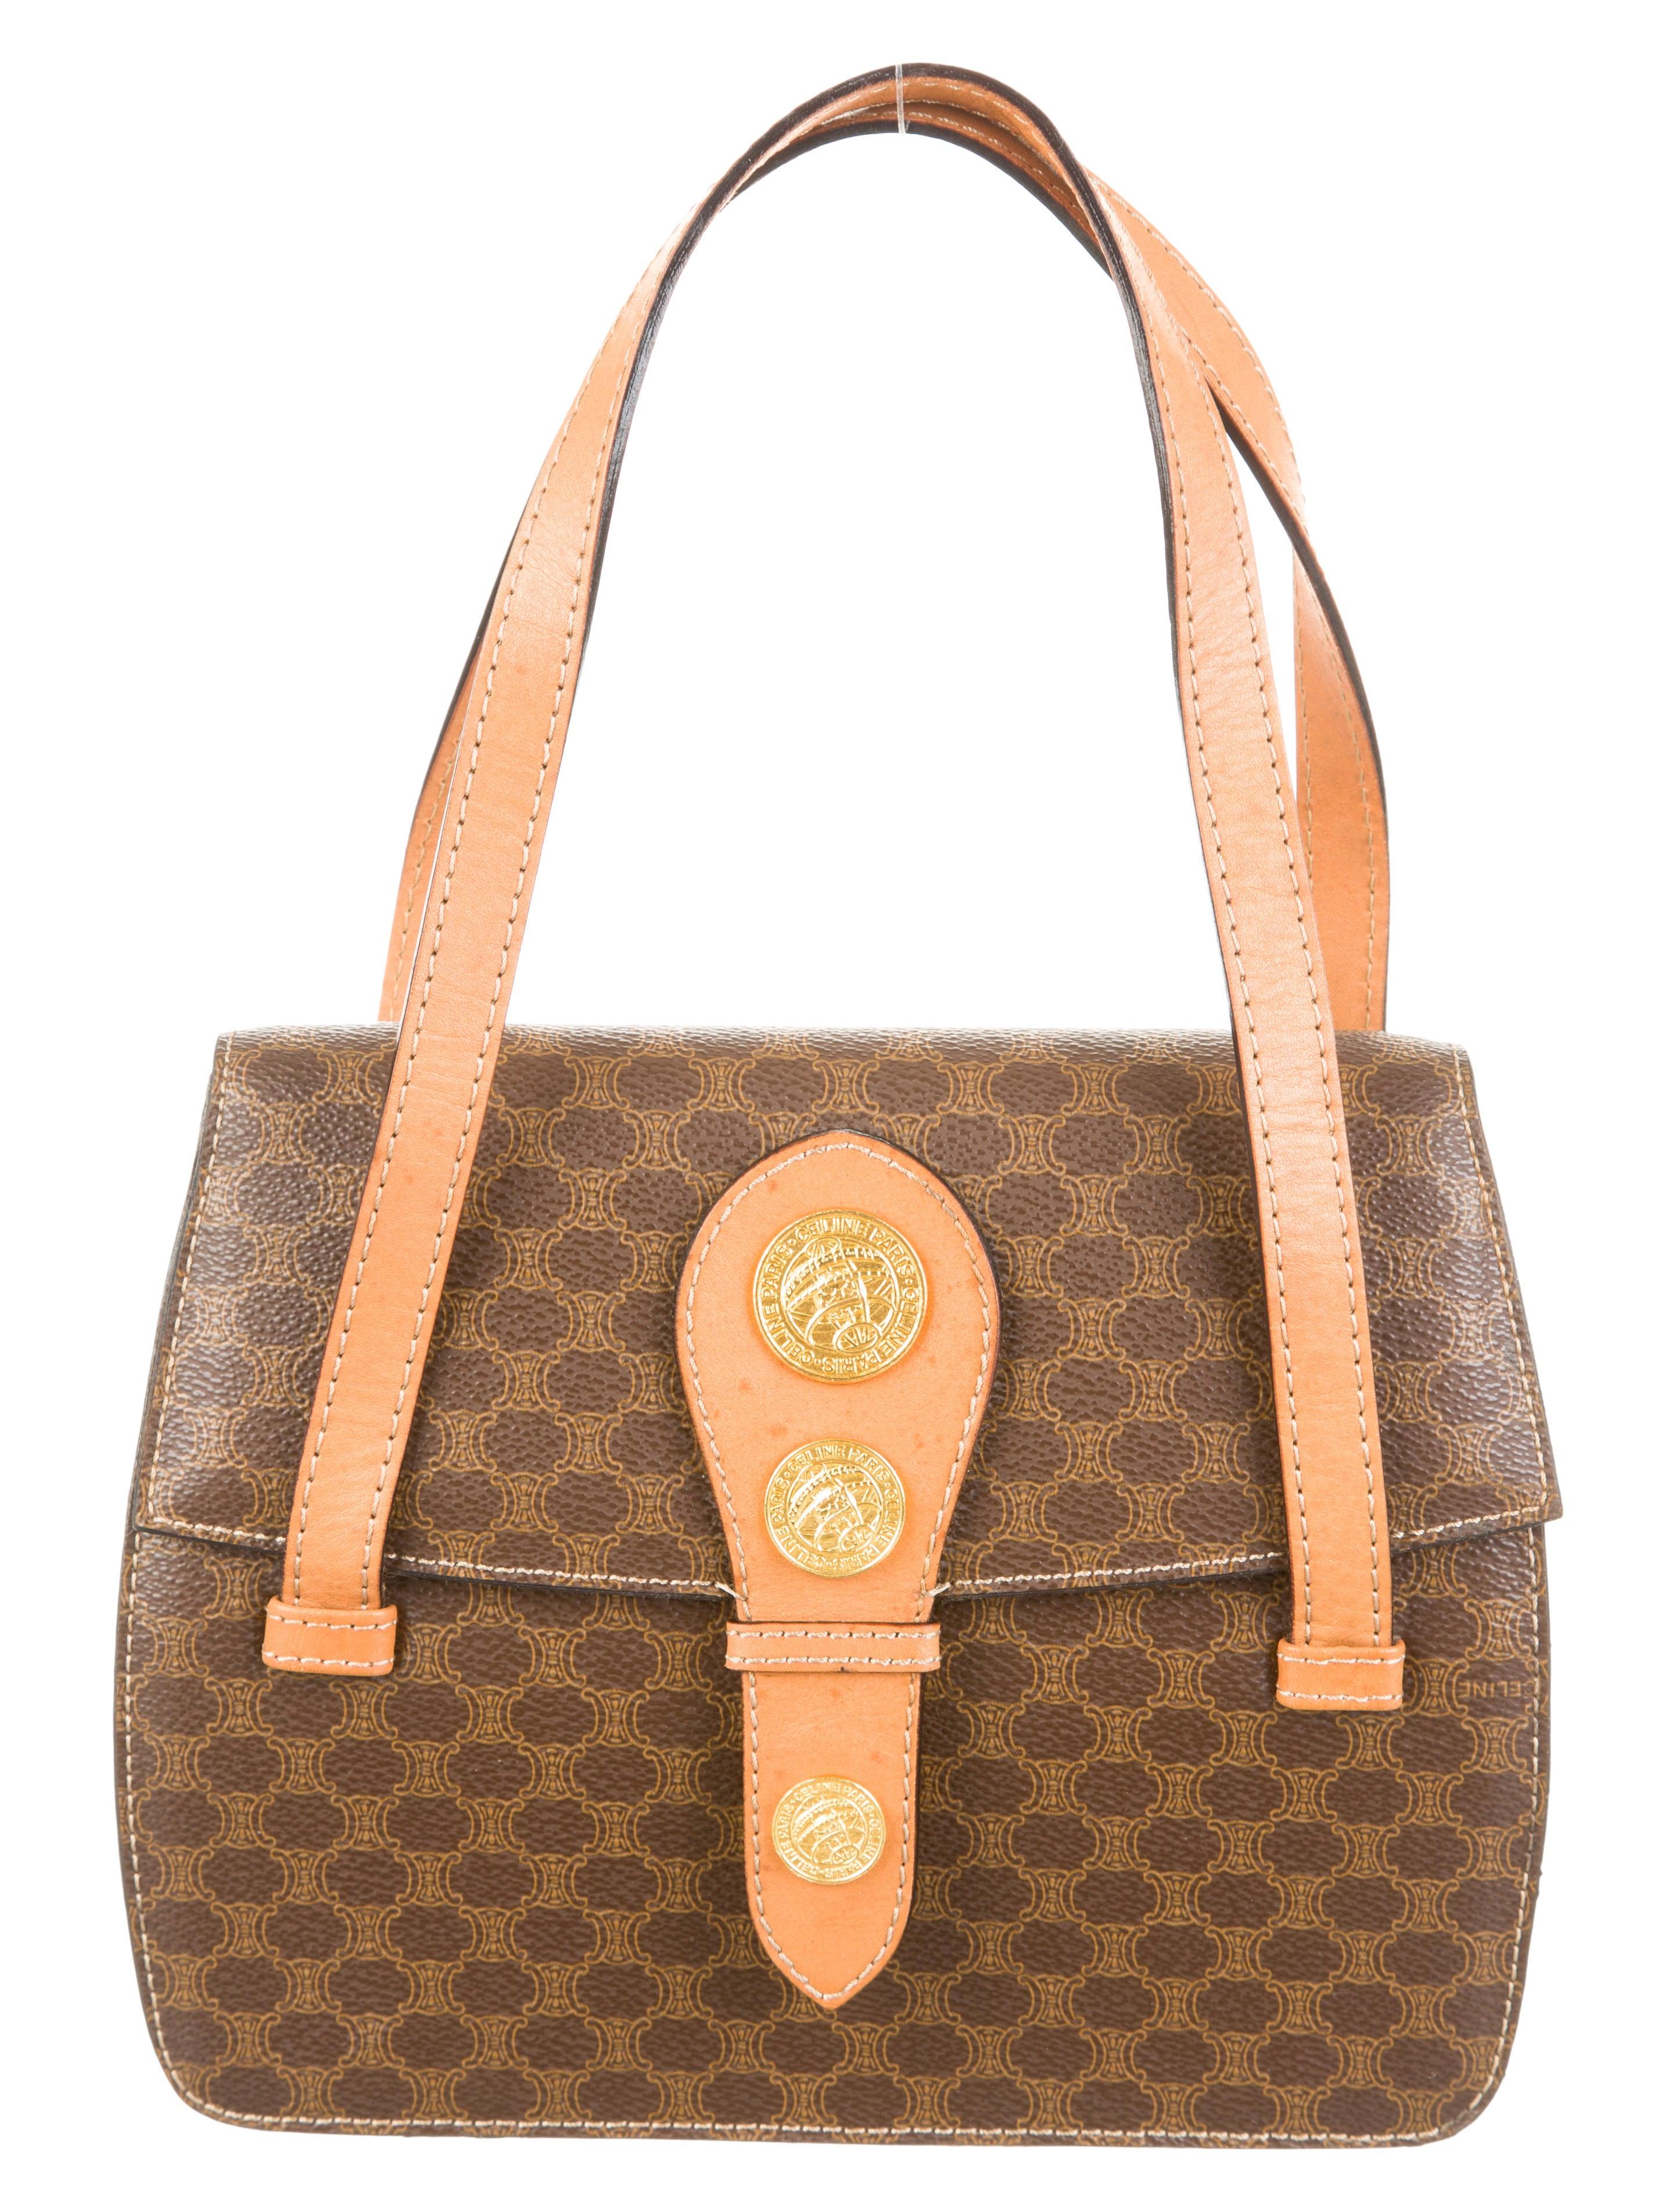 buy celine bag online - C��line Handle Bag - Handbags - CEL29090 | The RealReal